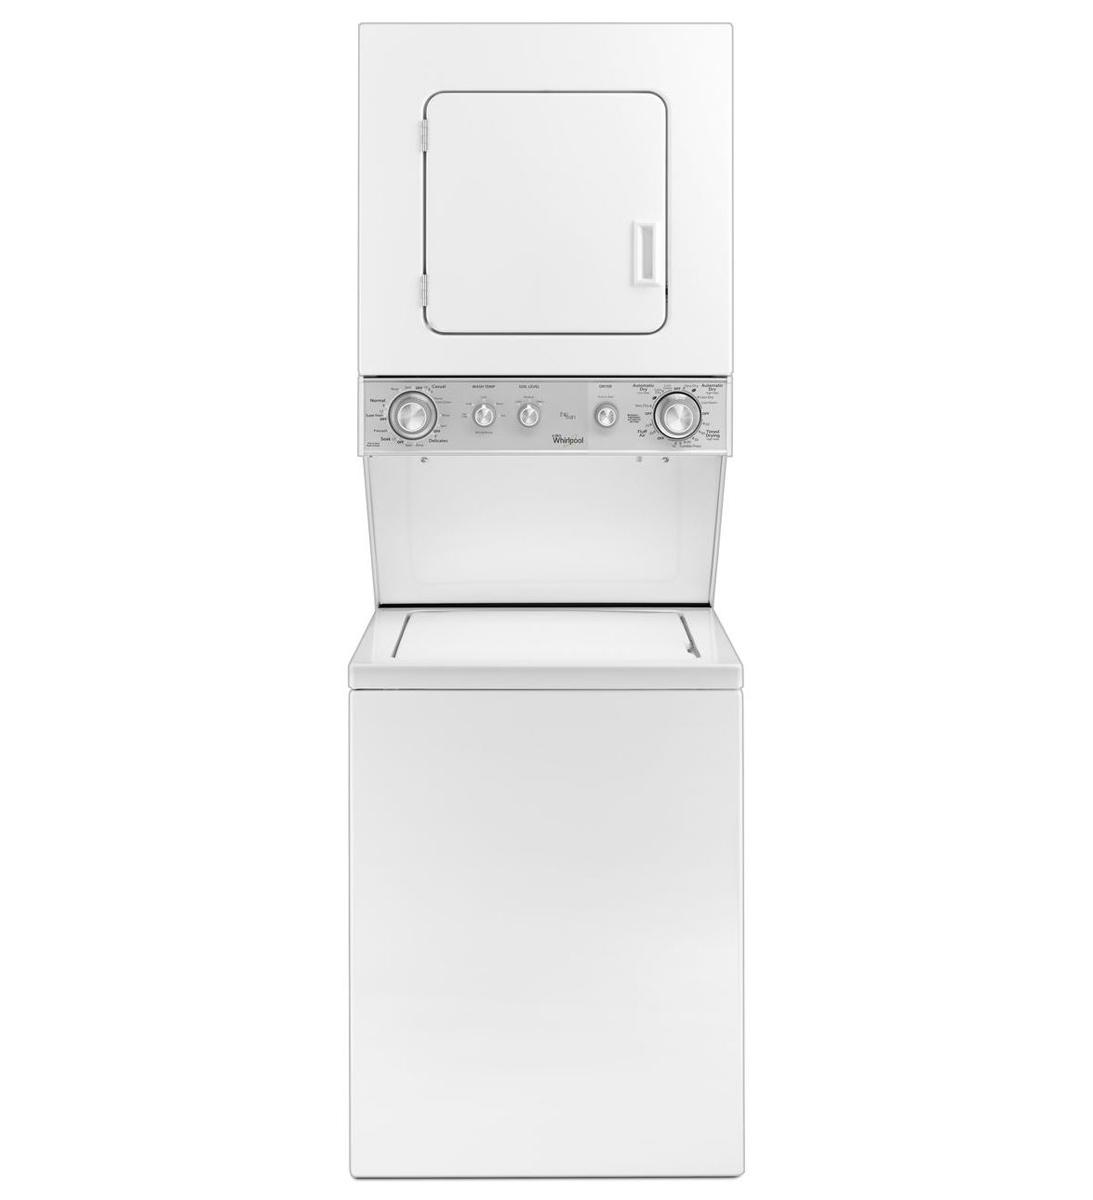 Image Result For Lg Stackable Washer Dryer Gas